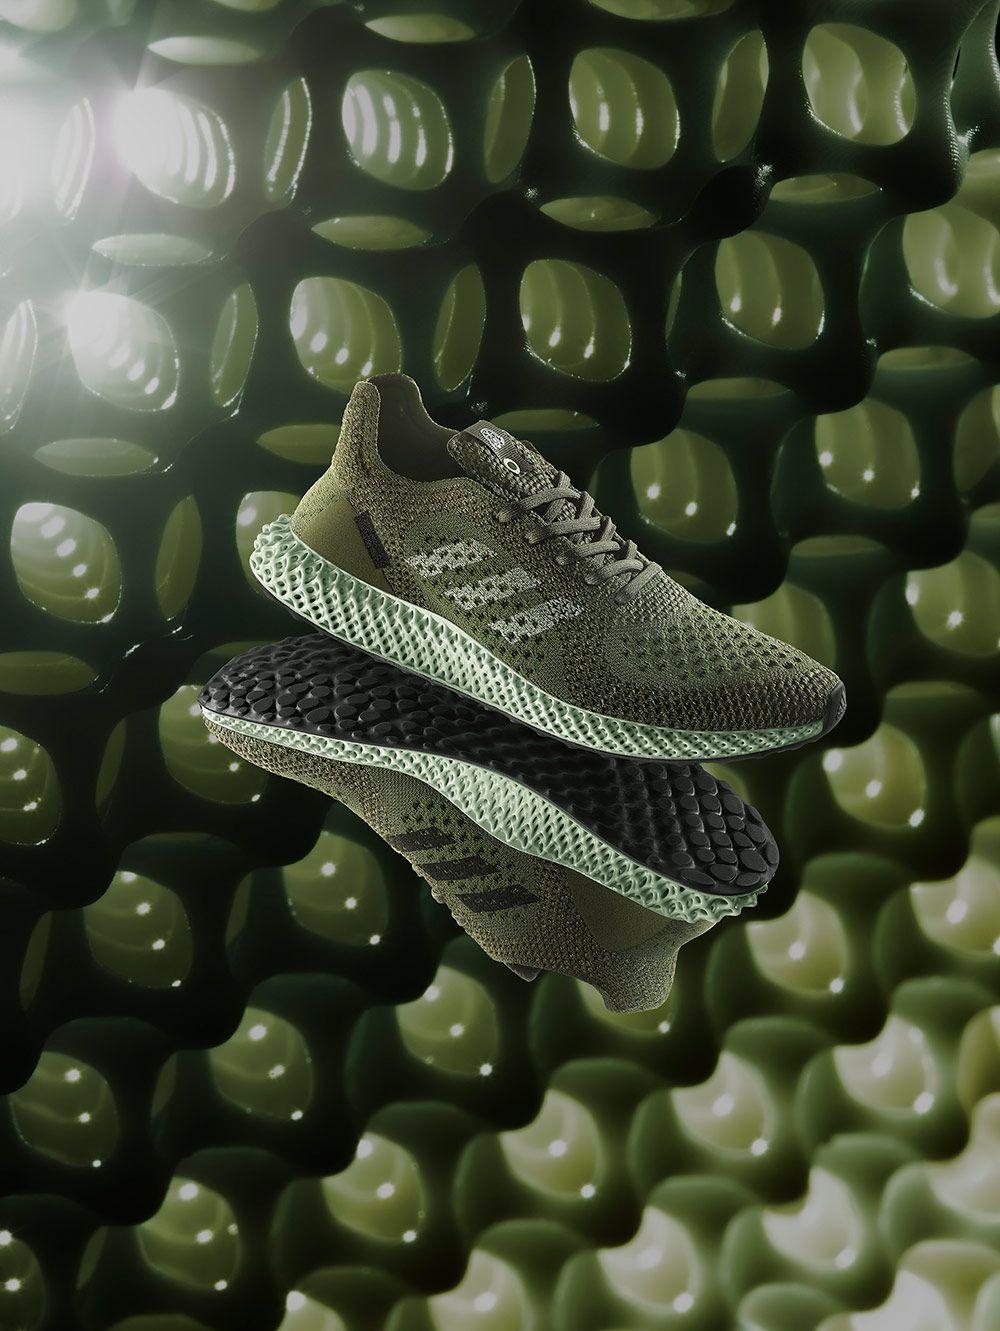 4be9ab619 adidas Originals Consortium 4D x Footpatrol